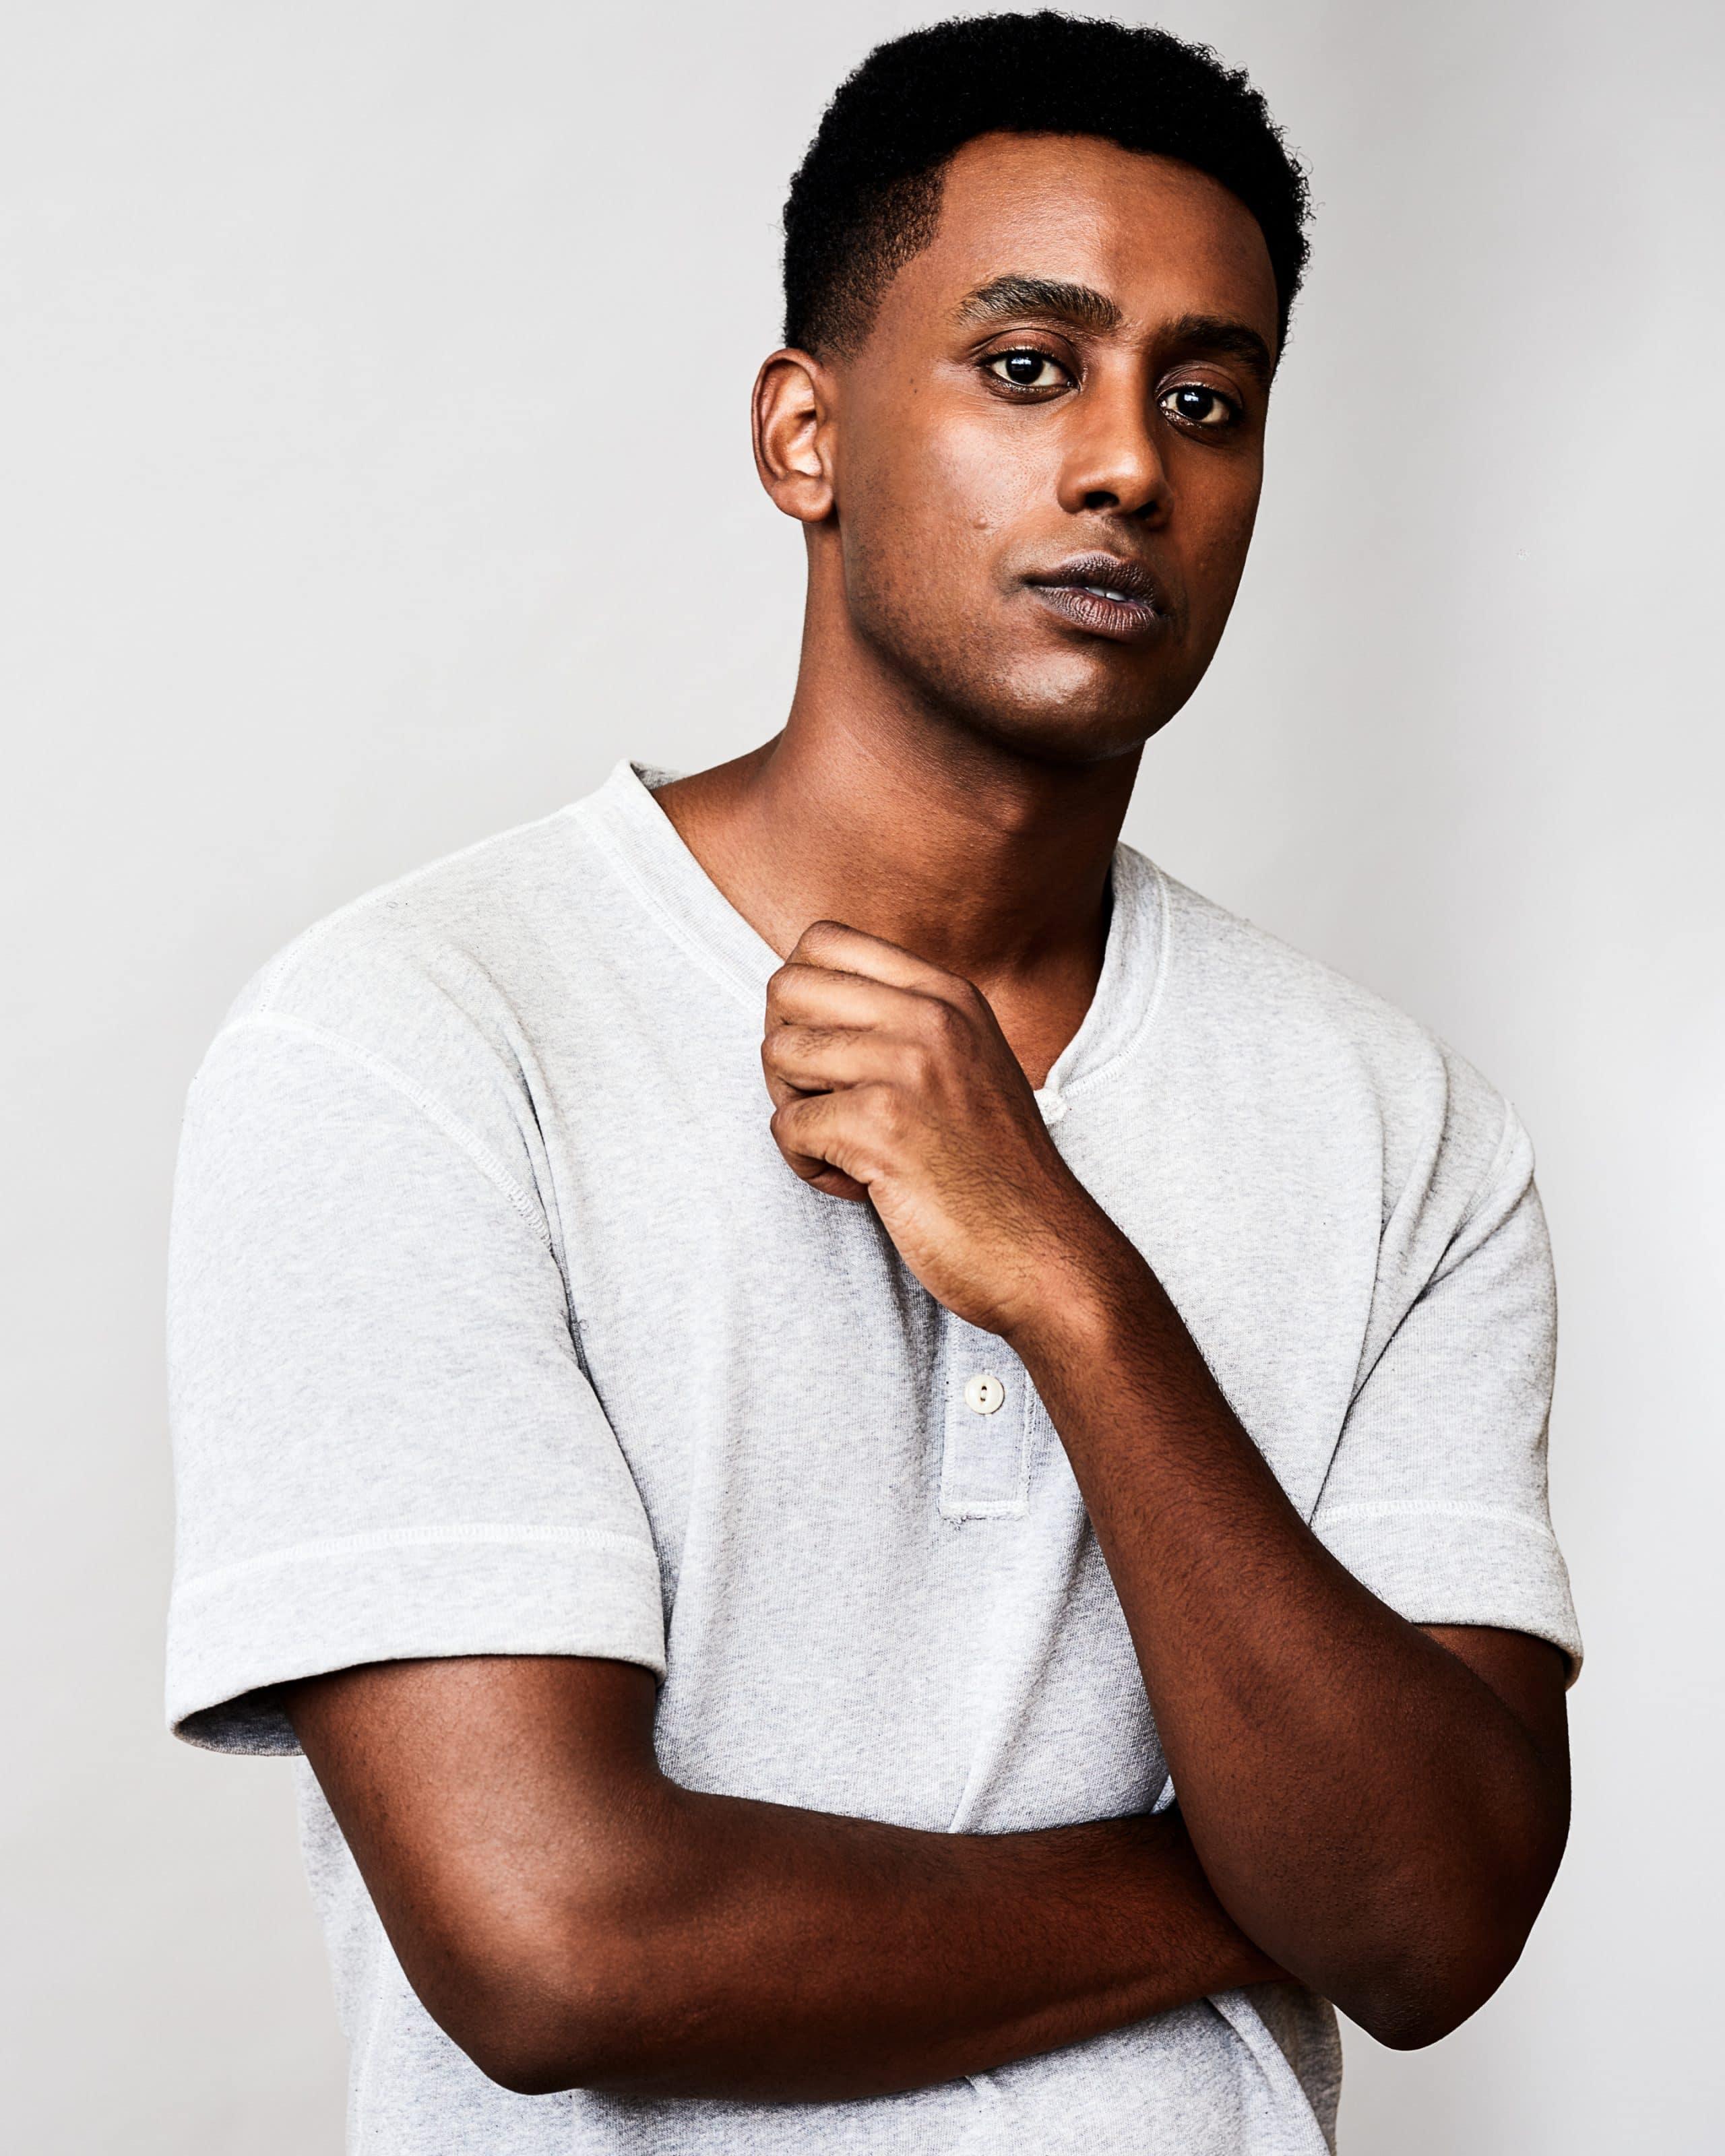 Araya Mengesha Canadian Actor